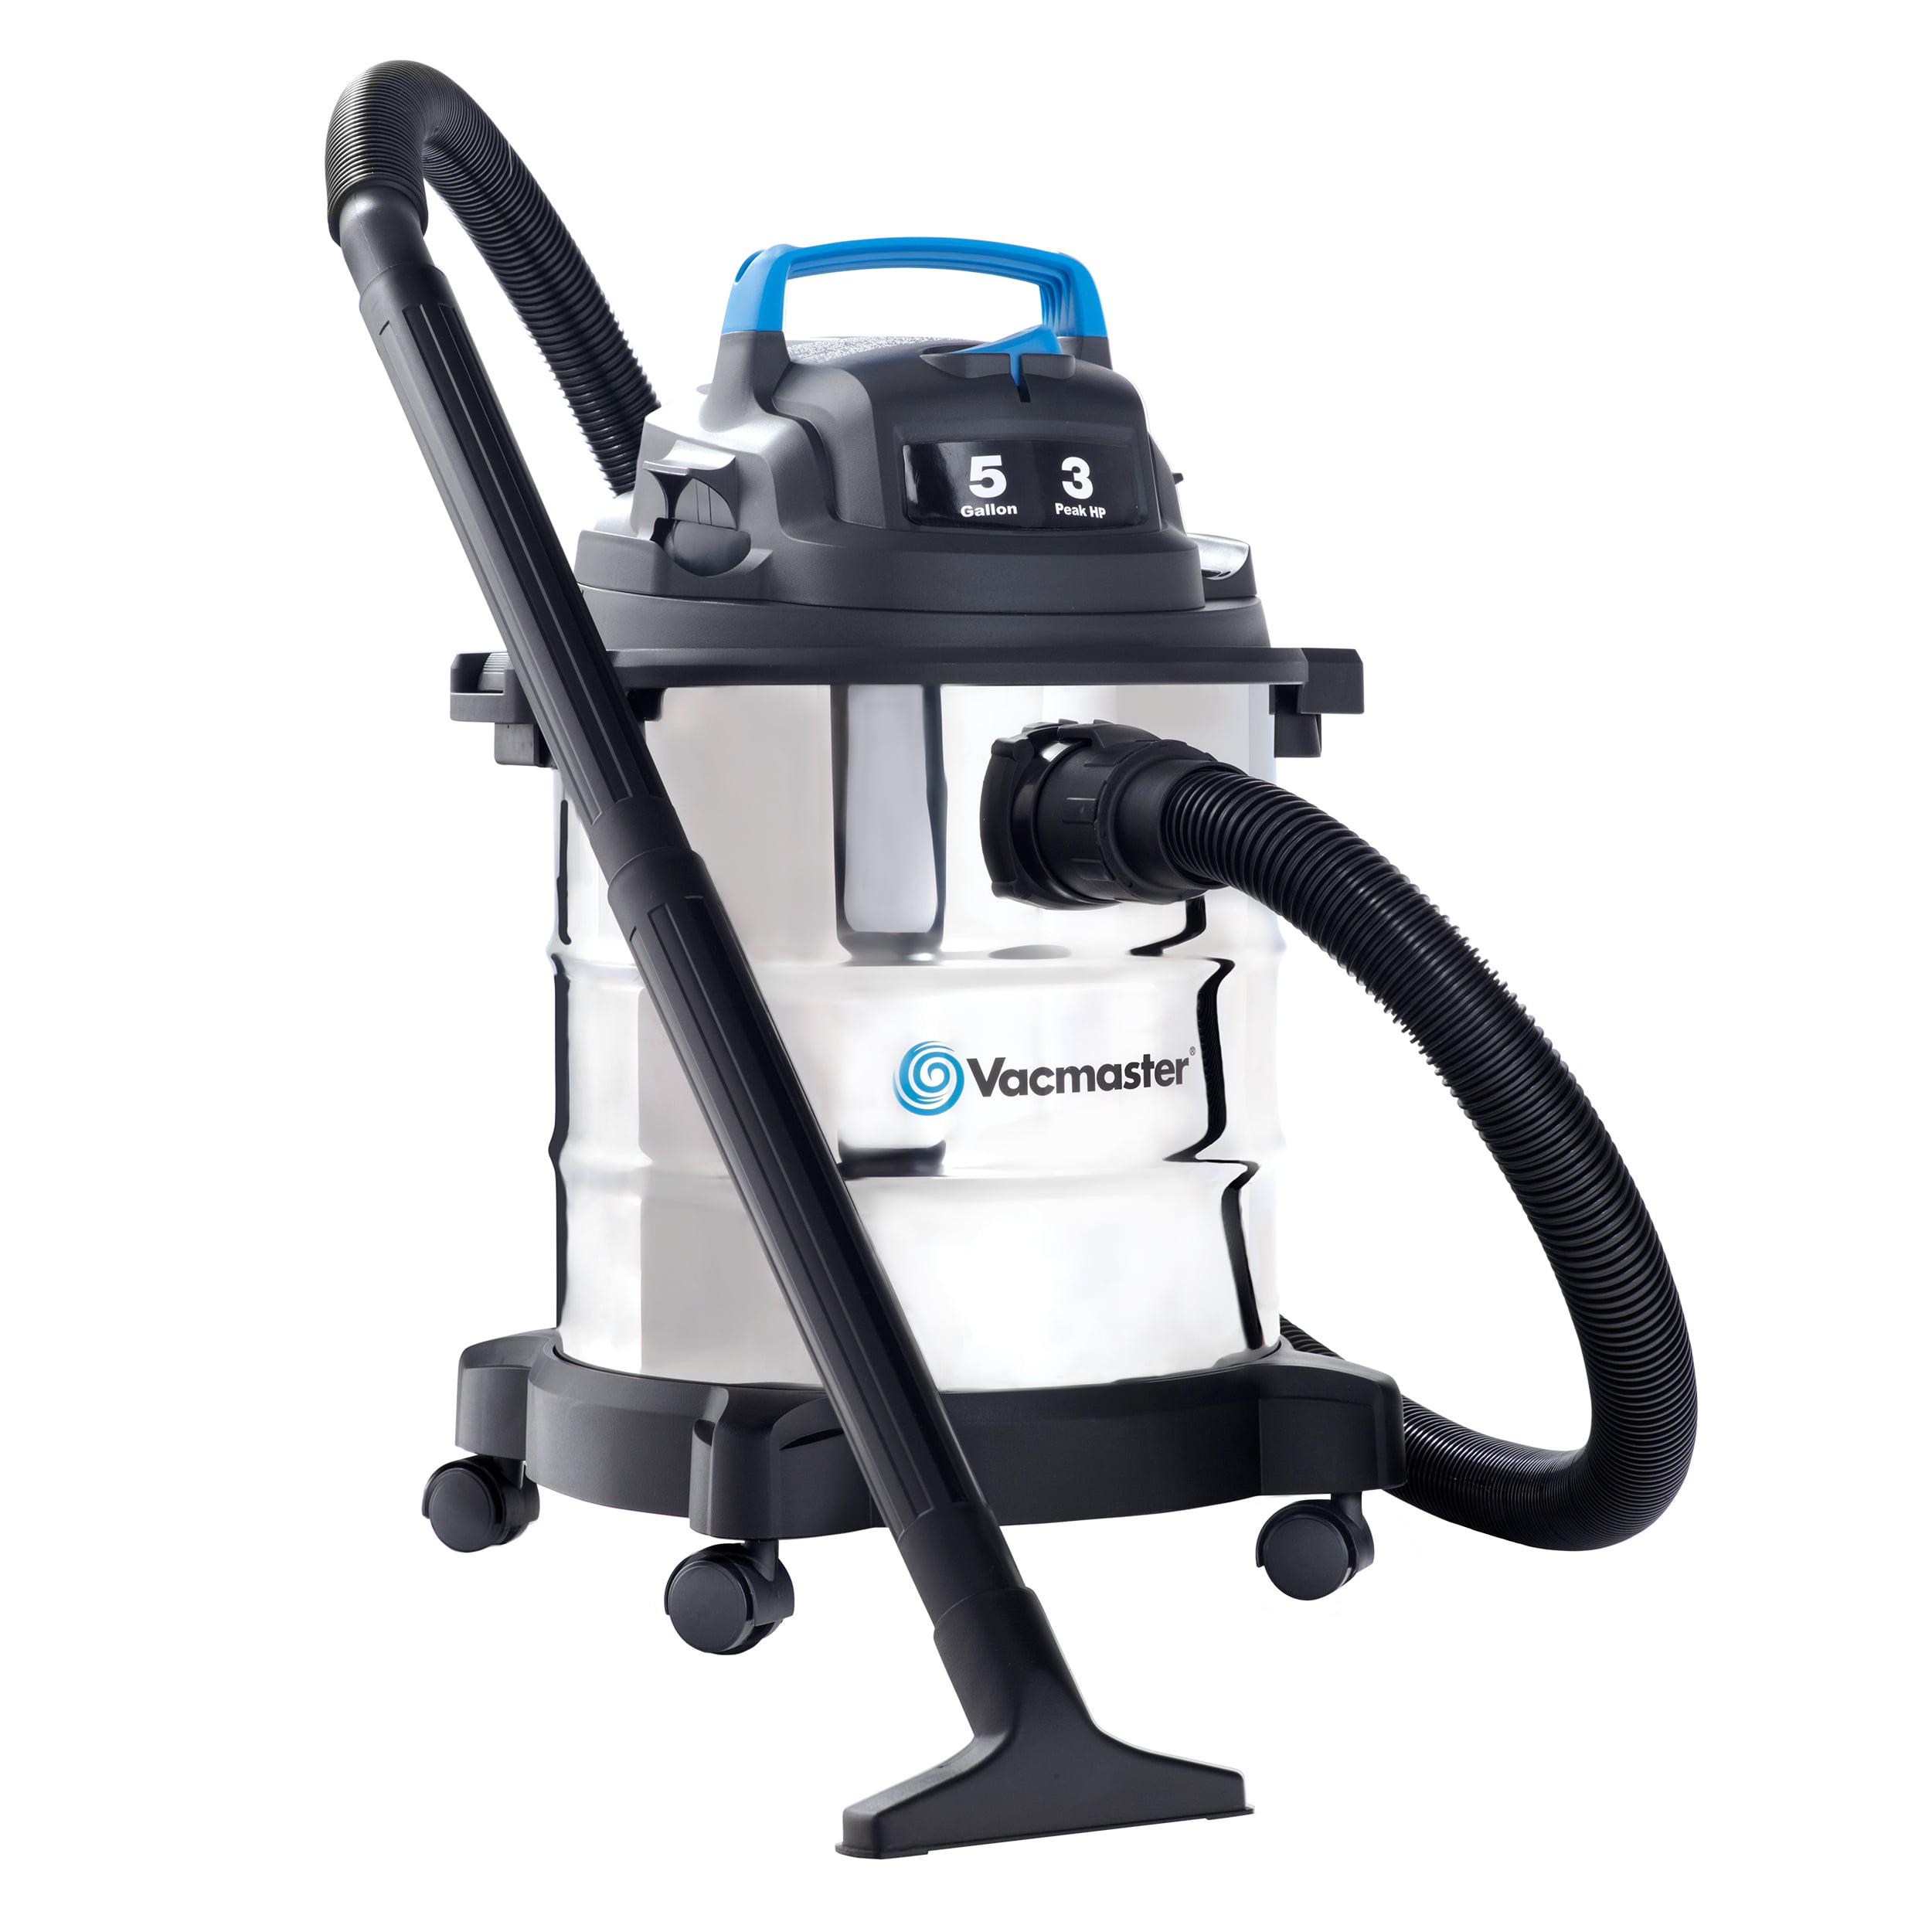 Vacmaster 5 Gallon, 3 HP Stainless Steel Tank Wet/Dry Vacuum